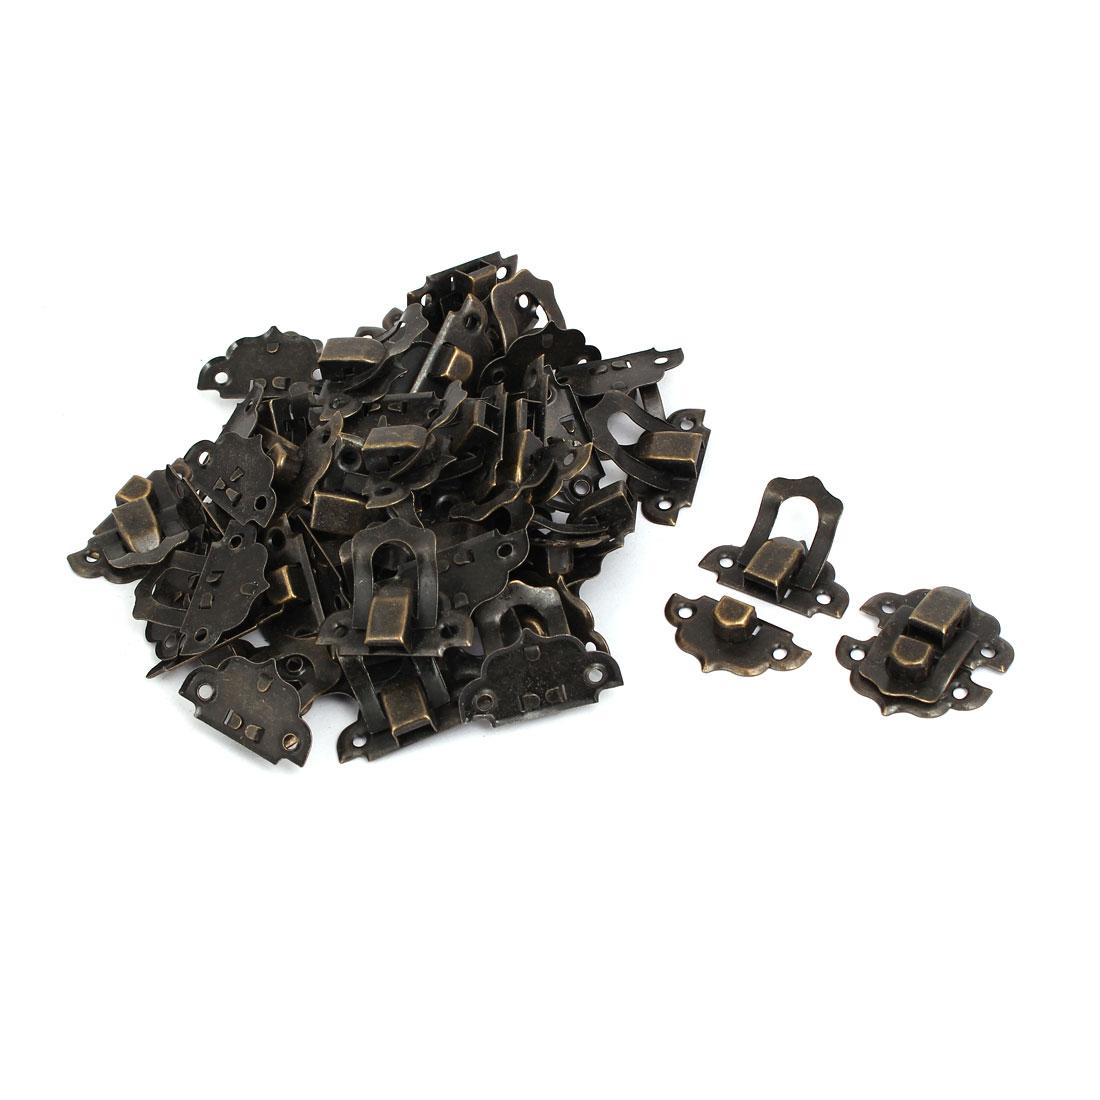 32mmx29mmx8mm Screw Fixed Catches Latches Locks Bronze Tone 30pcs for Box Case